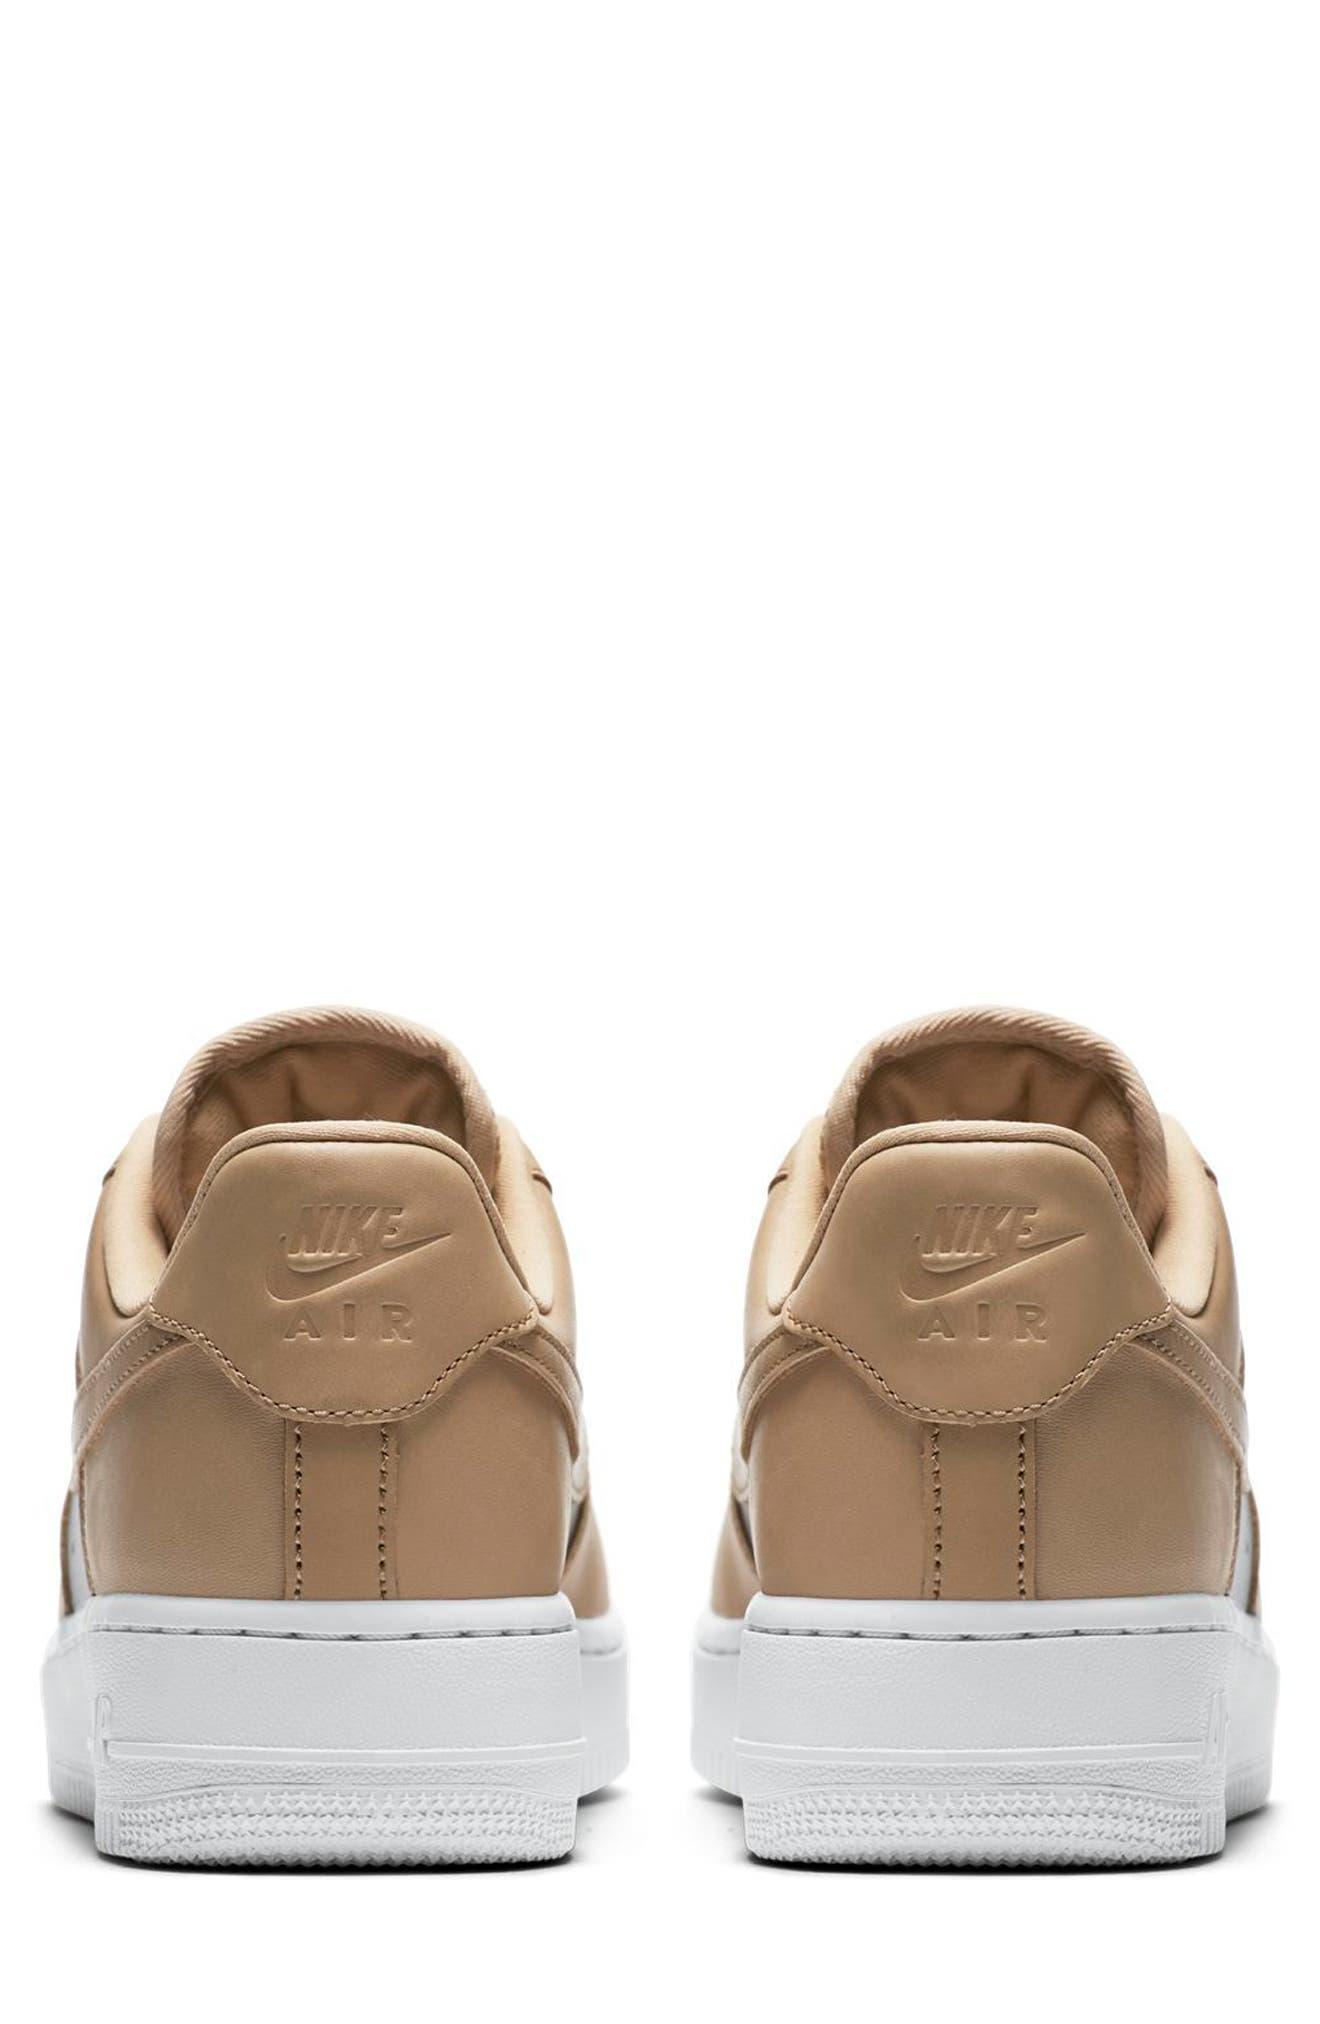 Air Force 1 '07 SE Premium Sneaker,                             Alternate thumbnail 2, color,                             Beige/ Silver/ White